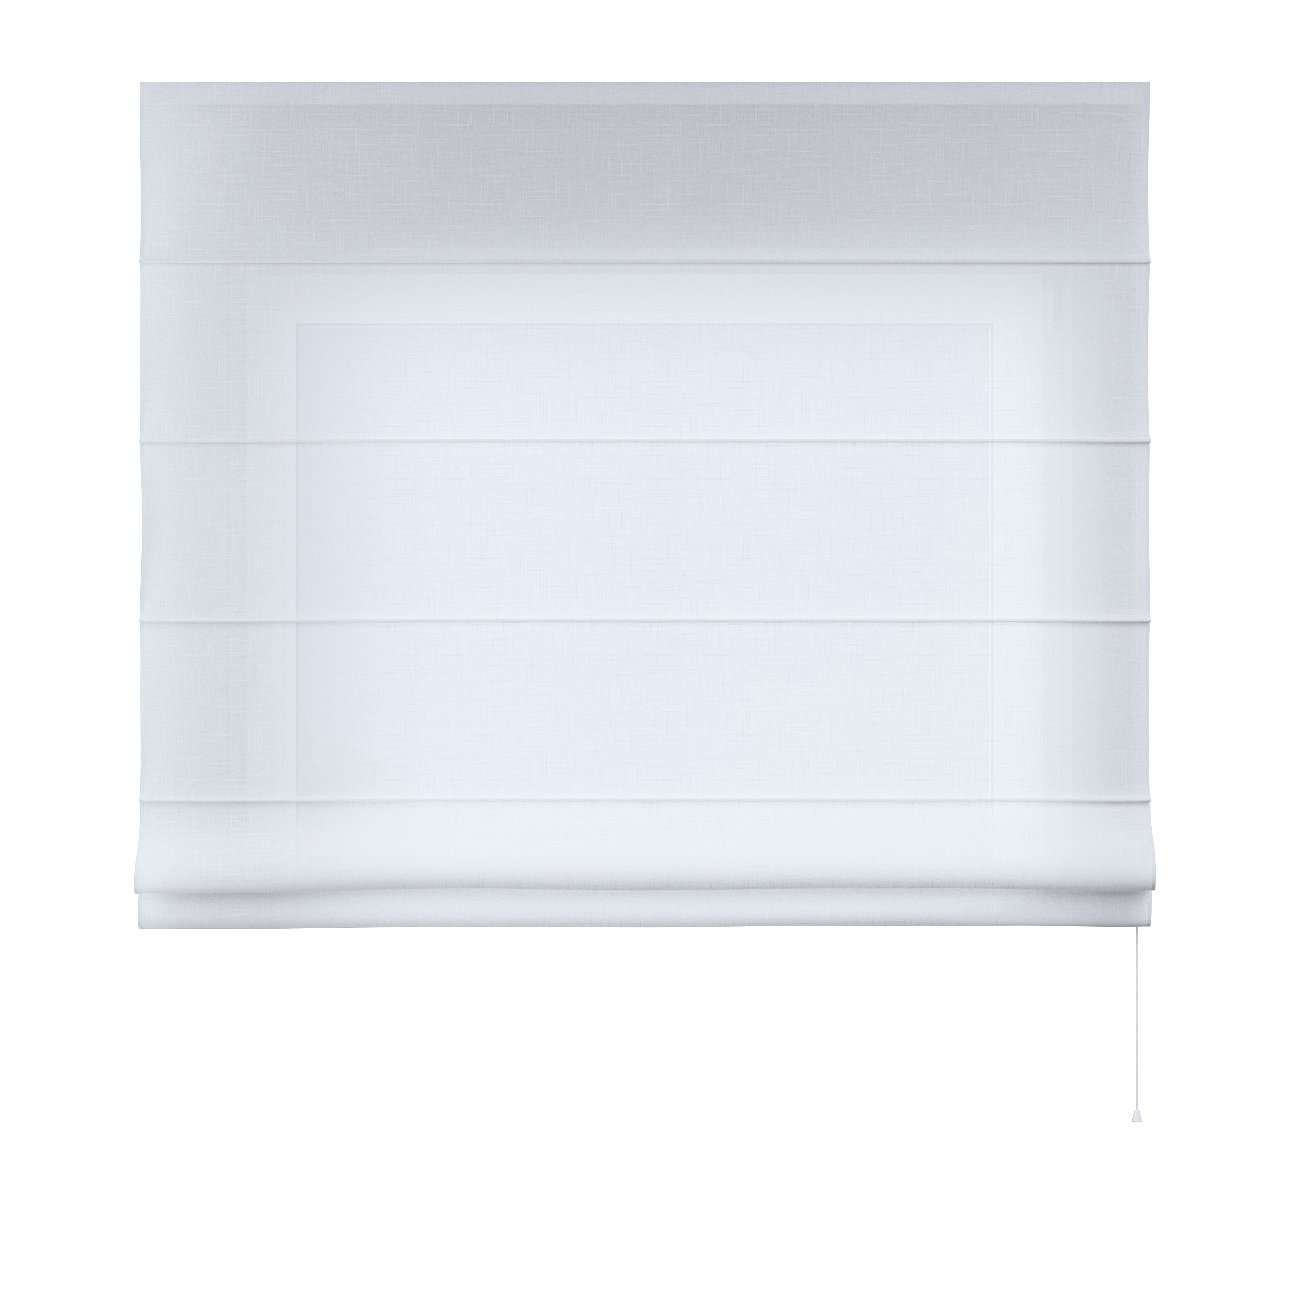 Romanetės Capri 80 x 170 cm (plotis x ilgis) kolekcijoje Romantica, audinys: 128-77